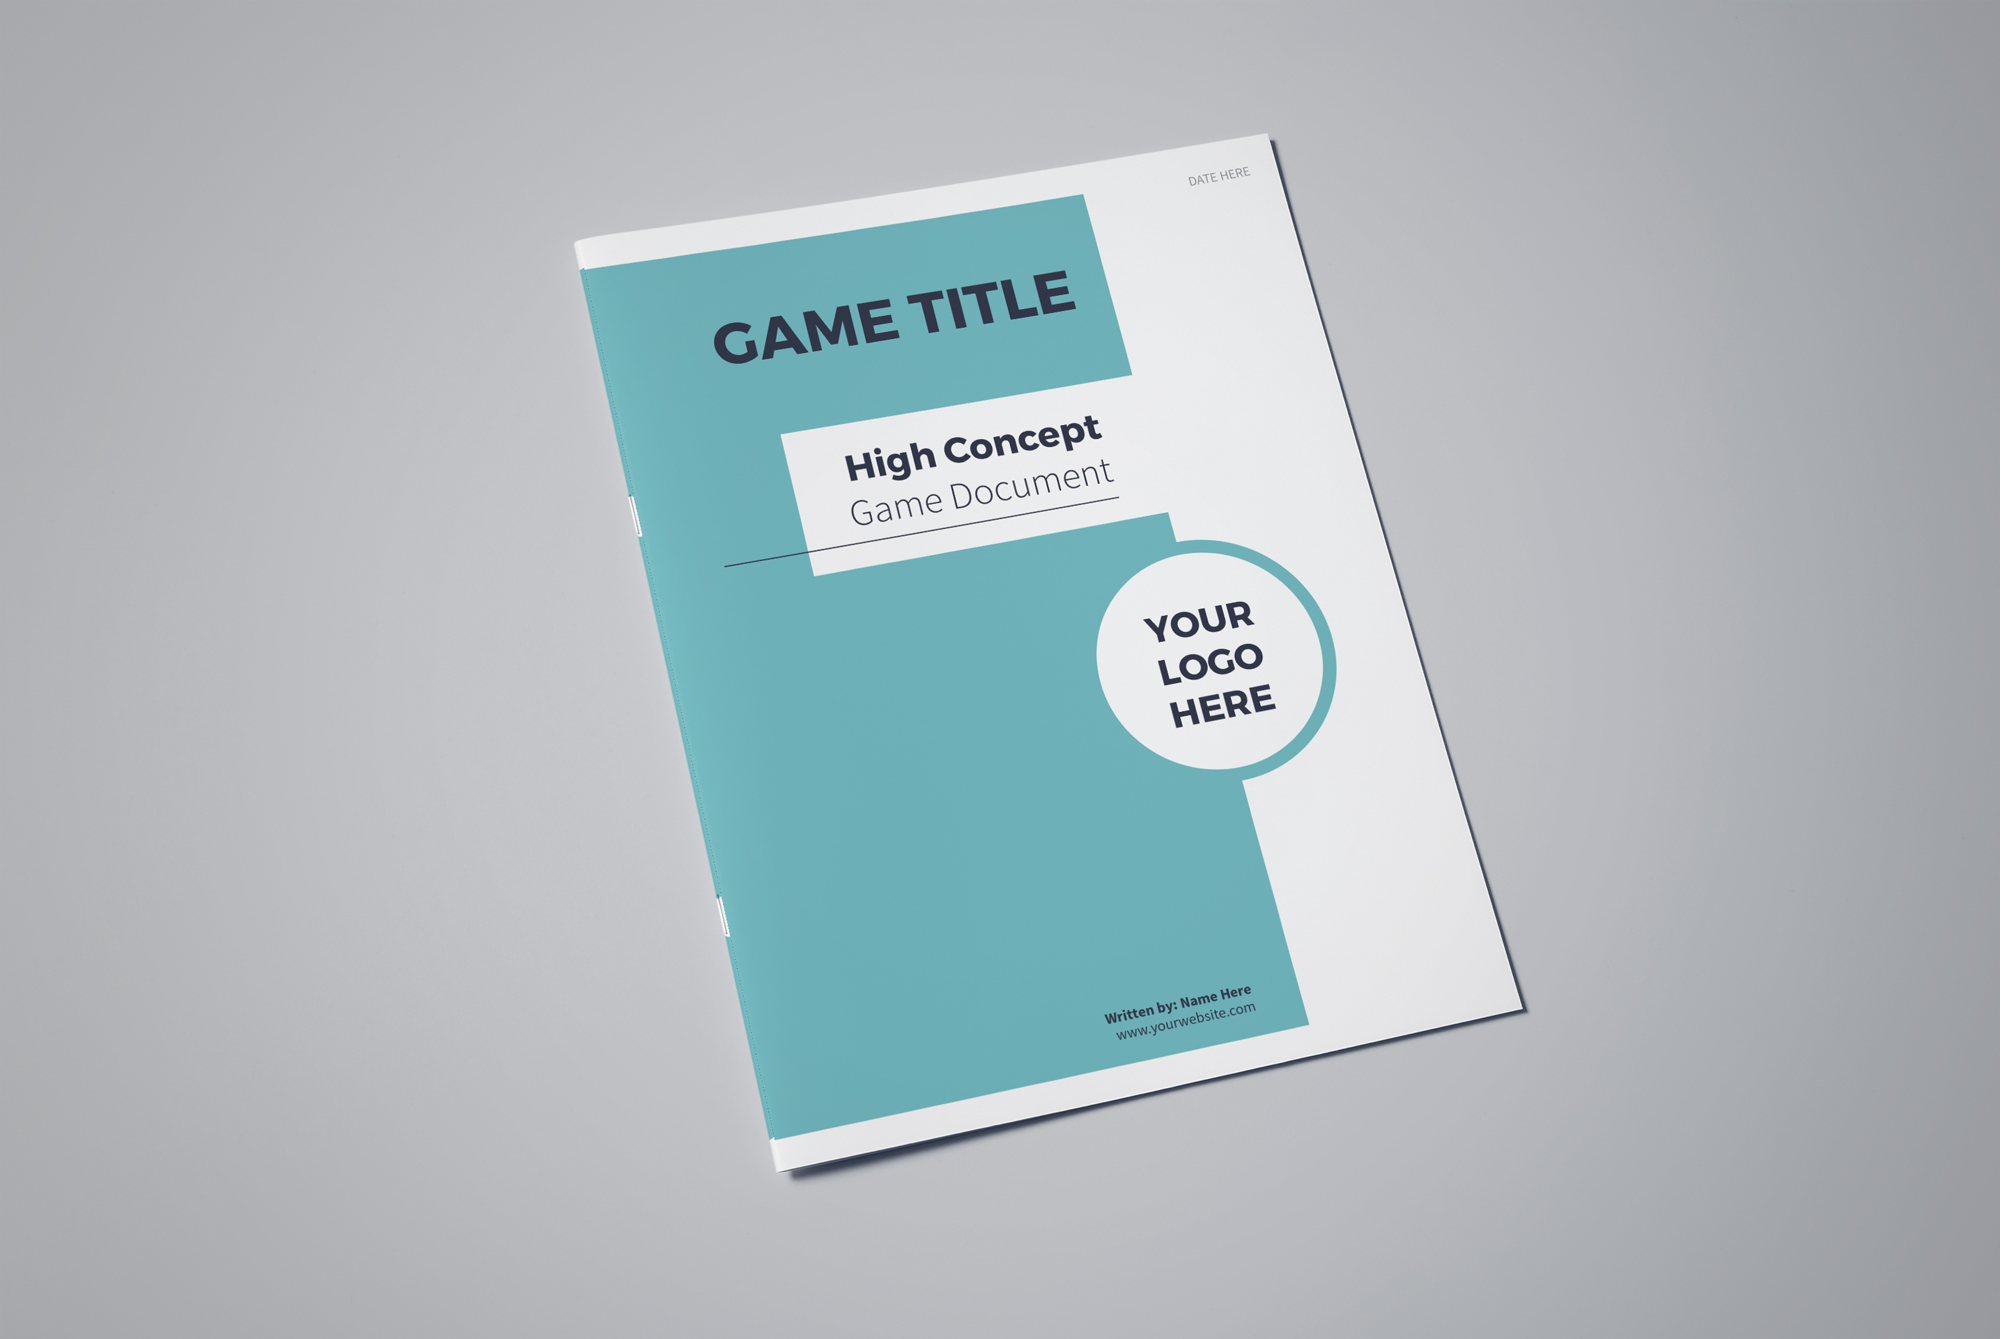 High Concept Game Document Template \u2014 Lauren Hodges Illustrator